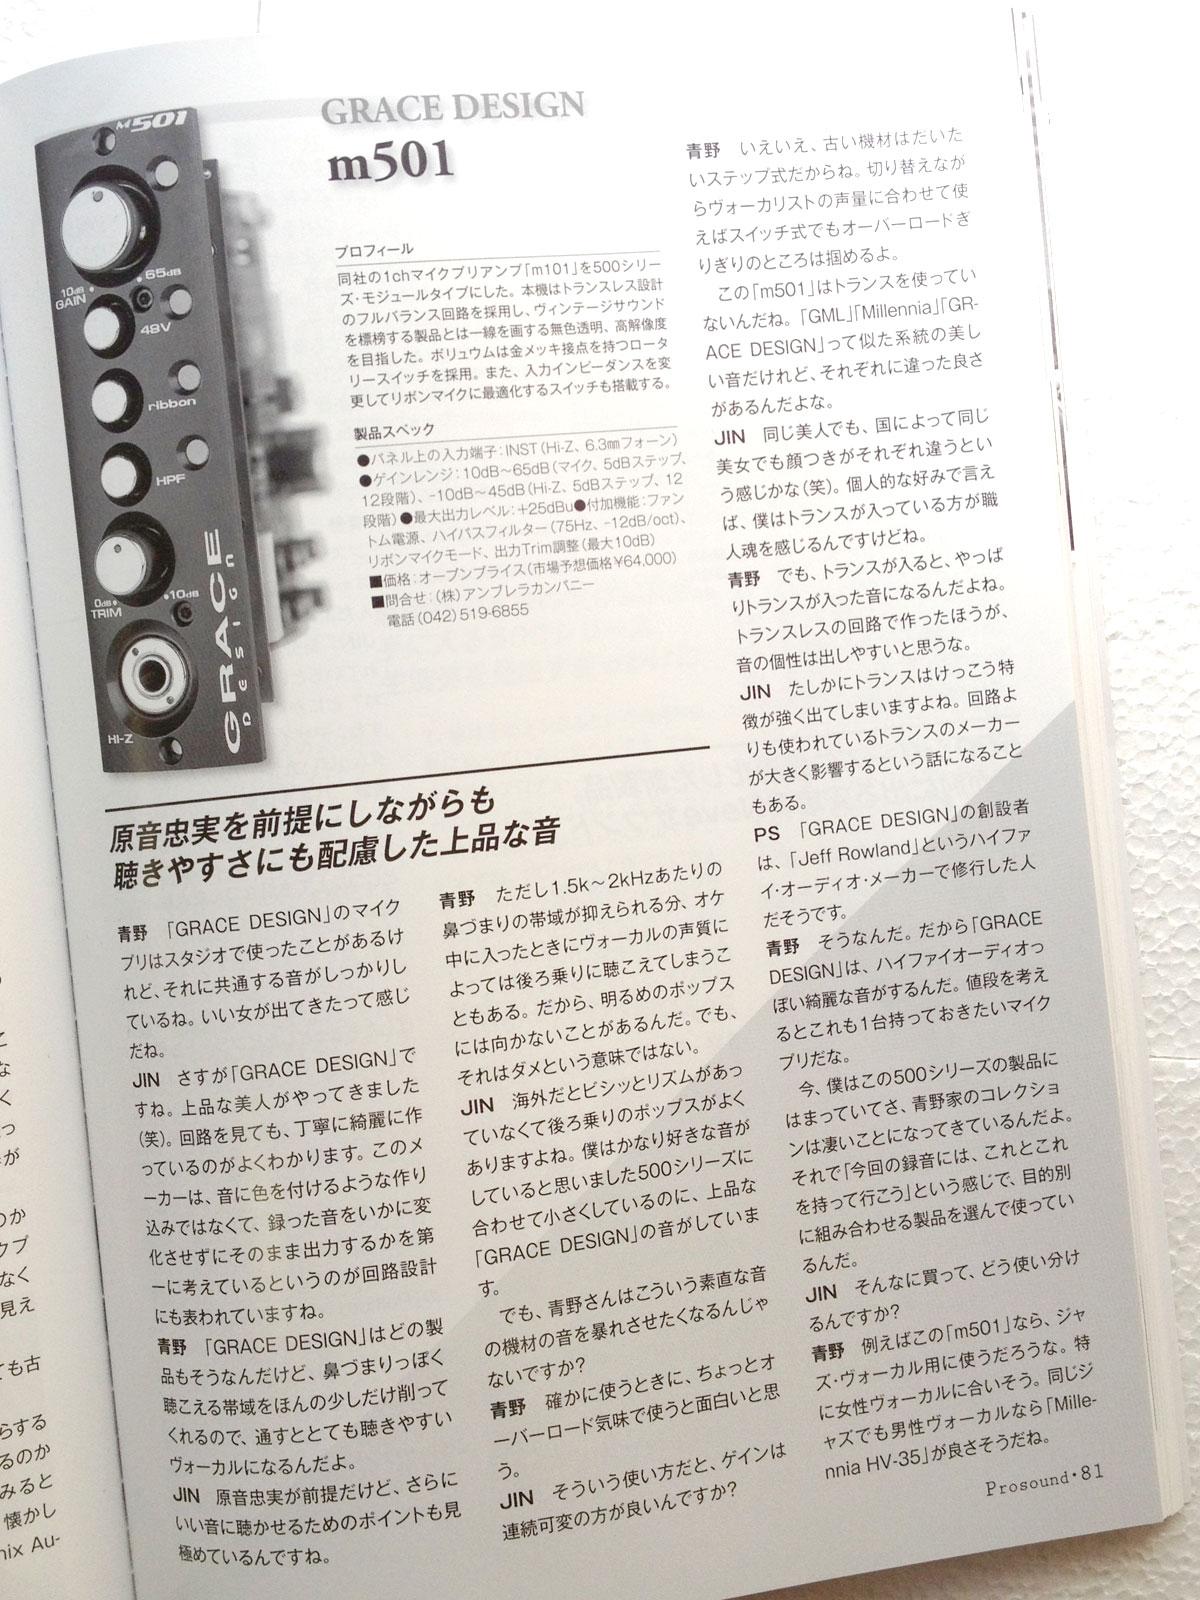 grace-m501-prosound-02-2014-review